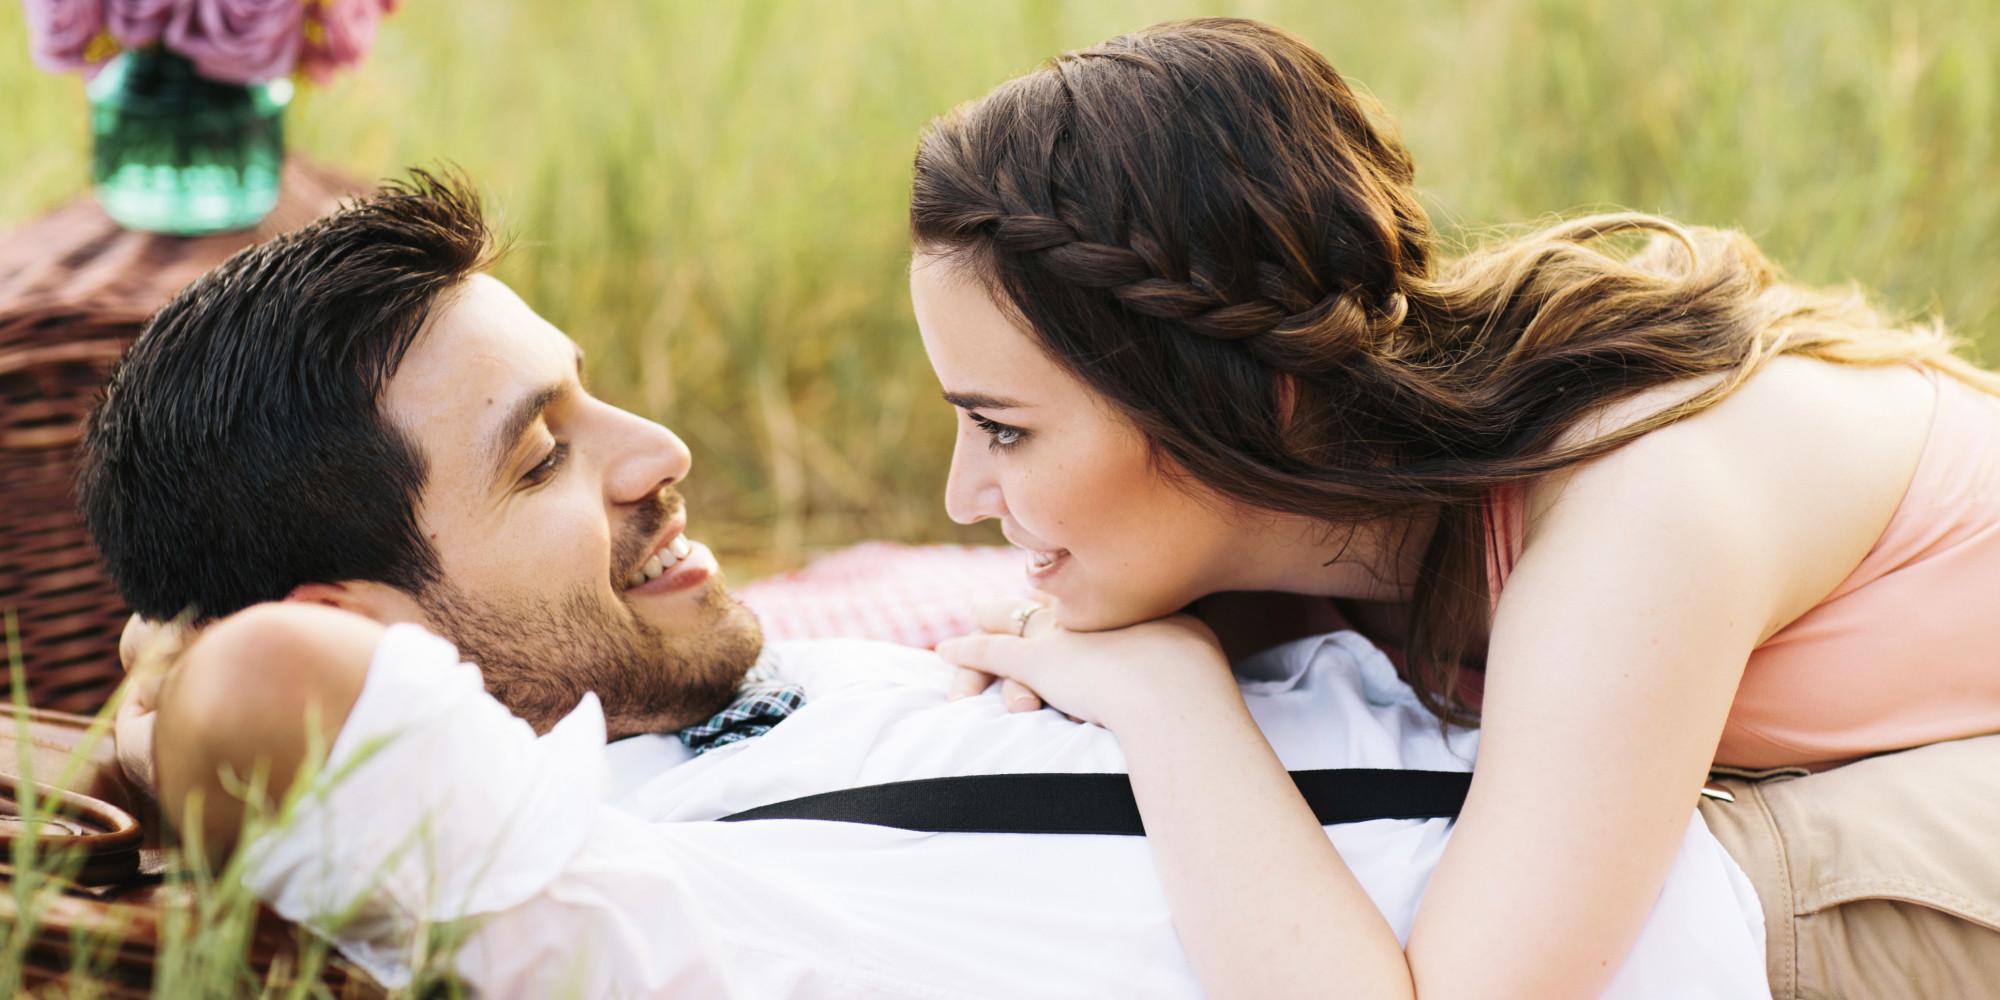 صورة صور رومانسيه للعشاق , صور رائعه لرومانسيه العشاق 3745 2